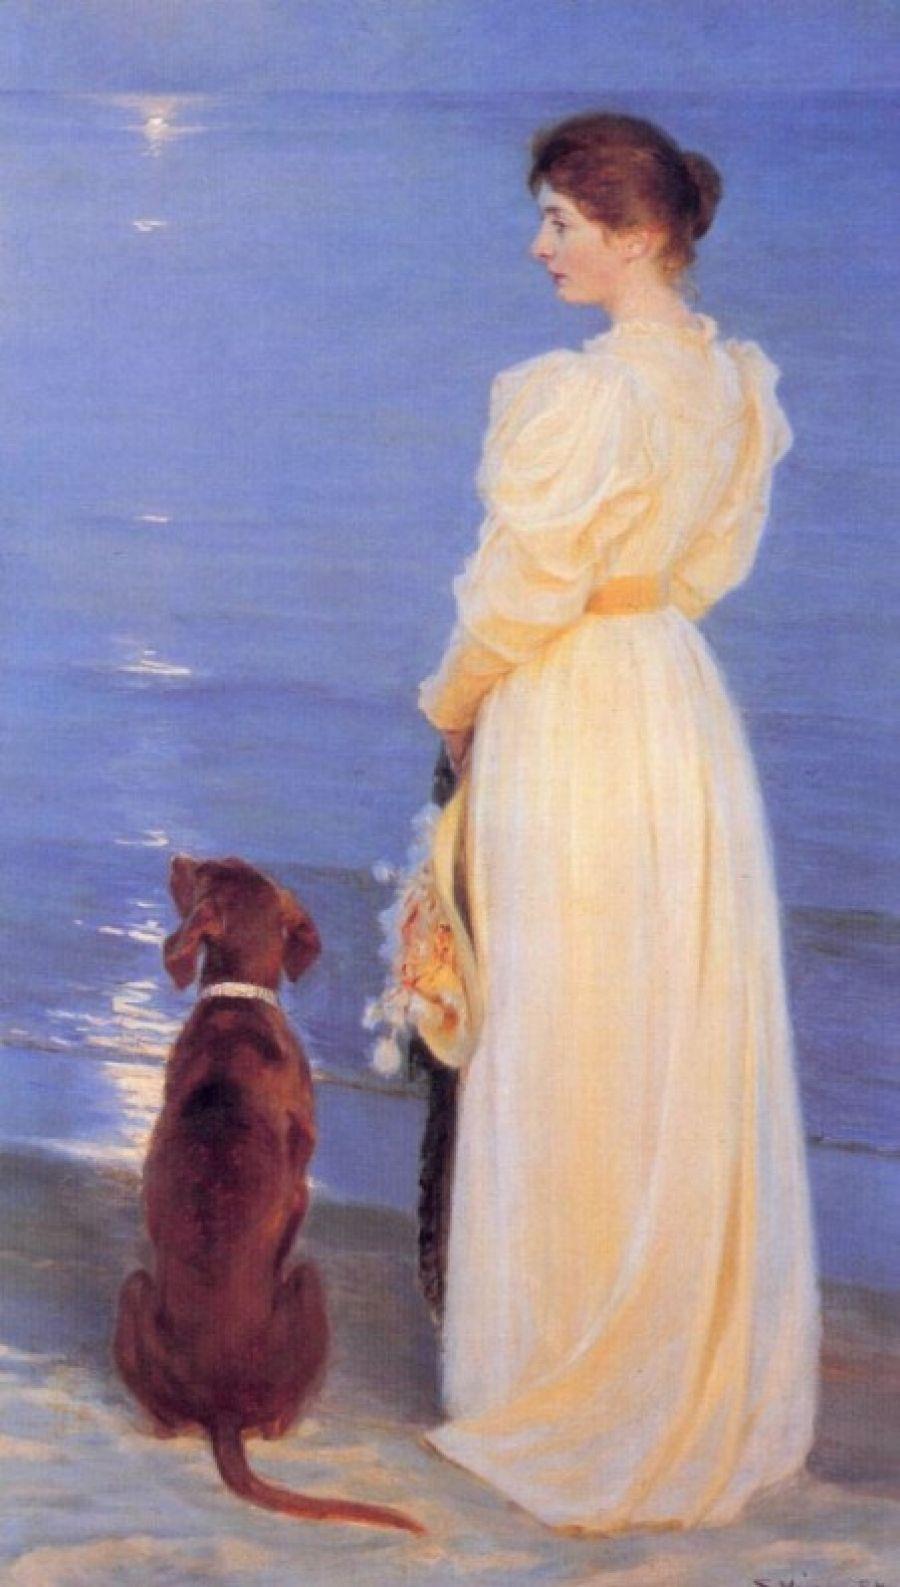 Peder Severin Krøyer. Summer evening at Skagen. The artist's wife and dog on the shore